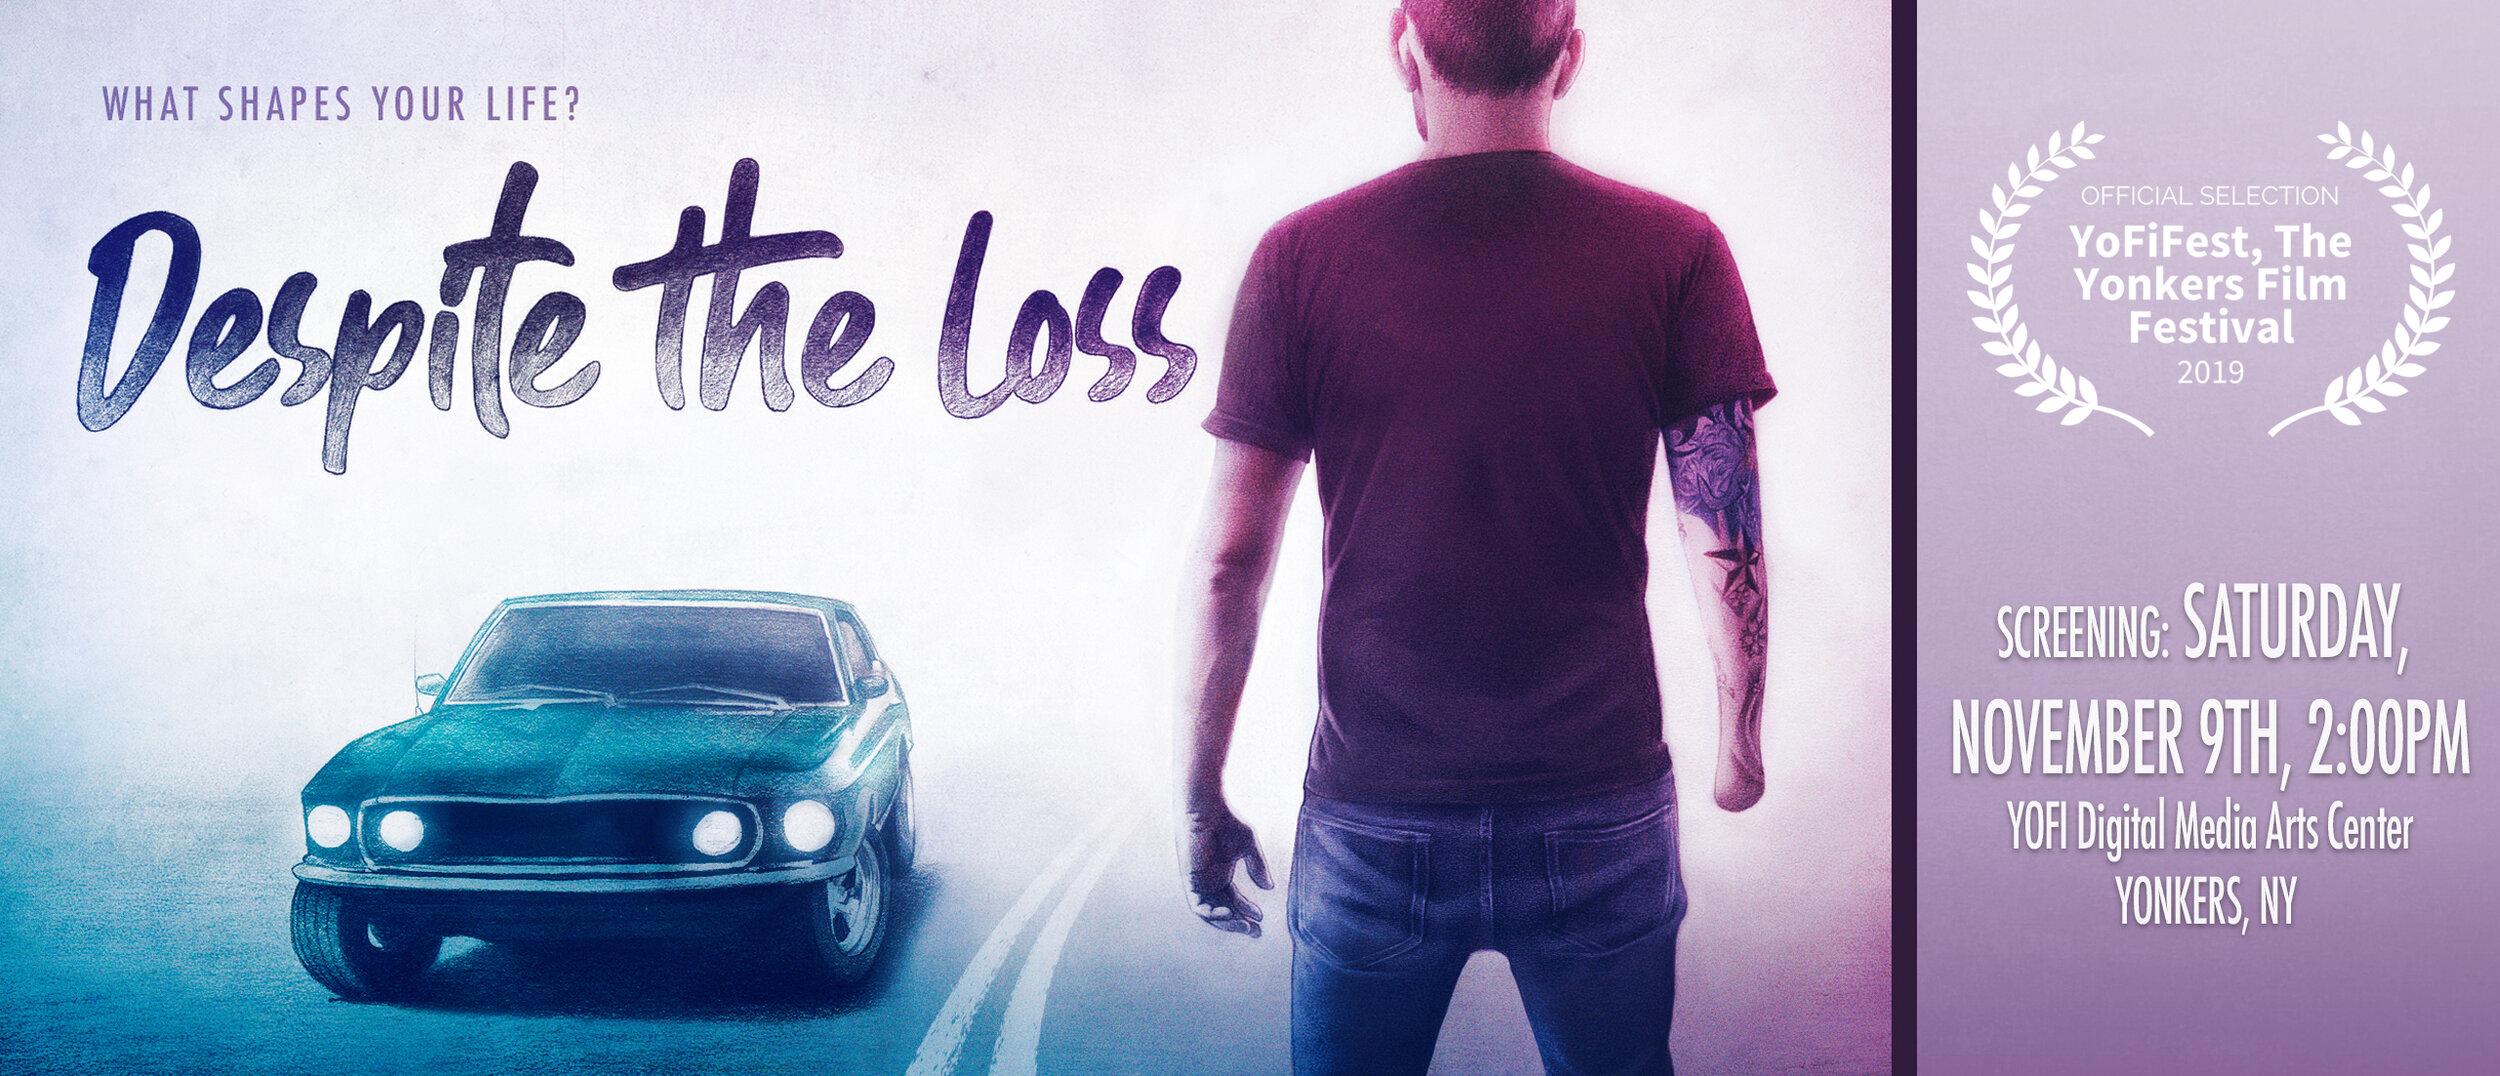 Despite_The_Loss_YoFiFest_Screening.jpg